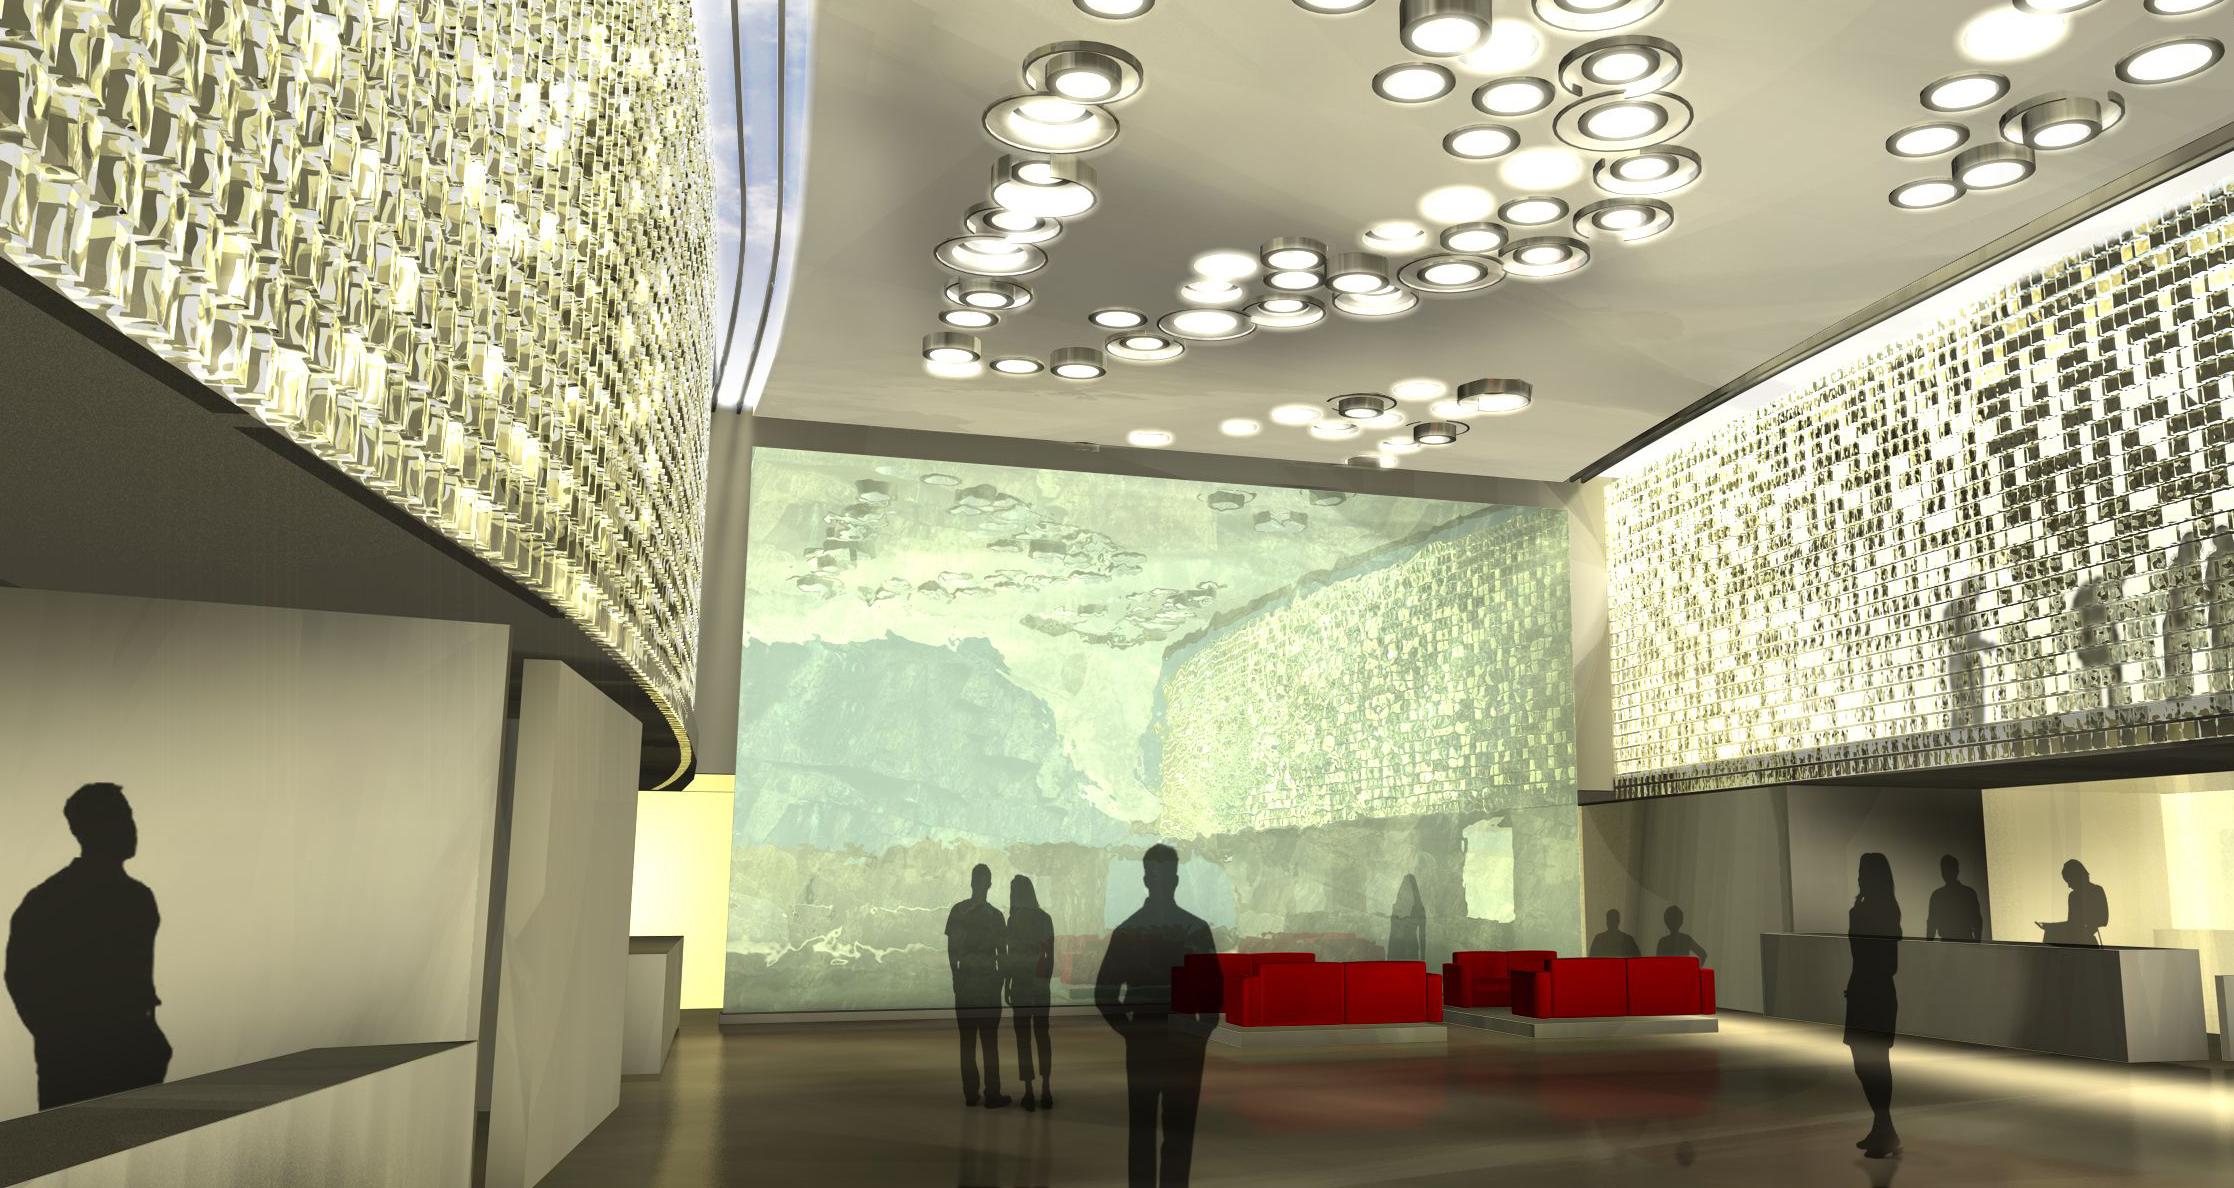 Progetti corsaro architettura torino for Studio architettura interni torino